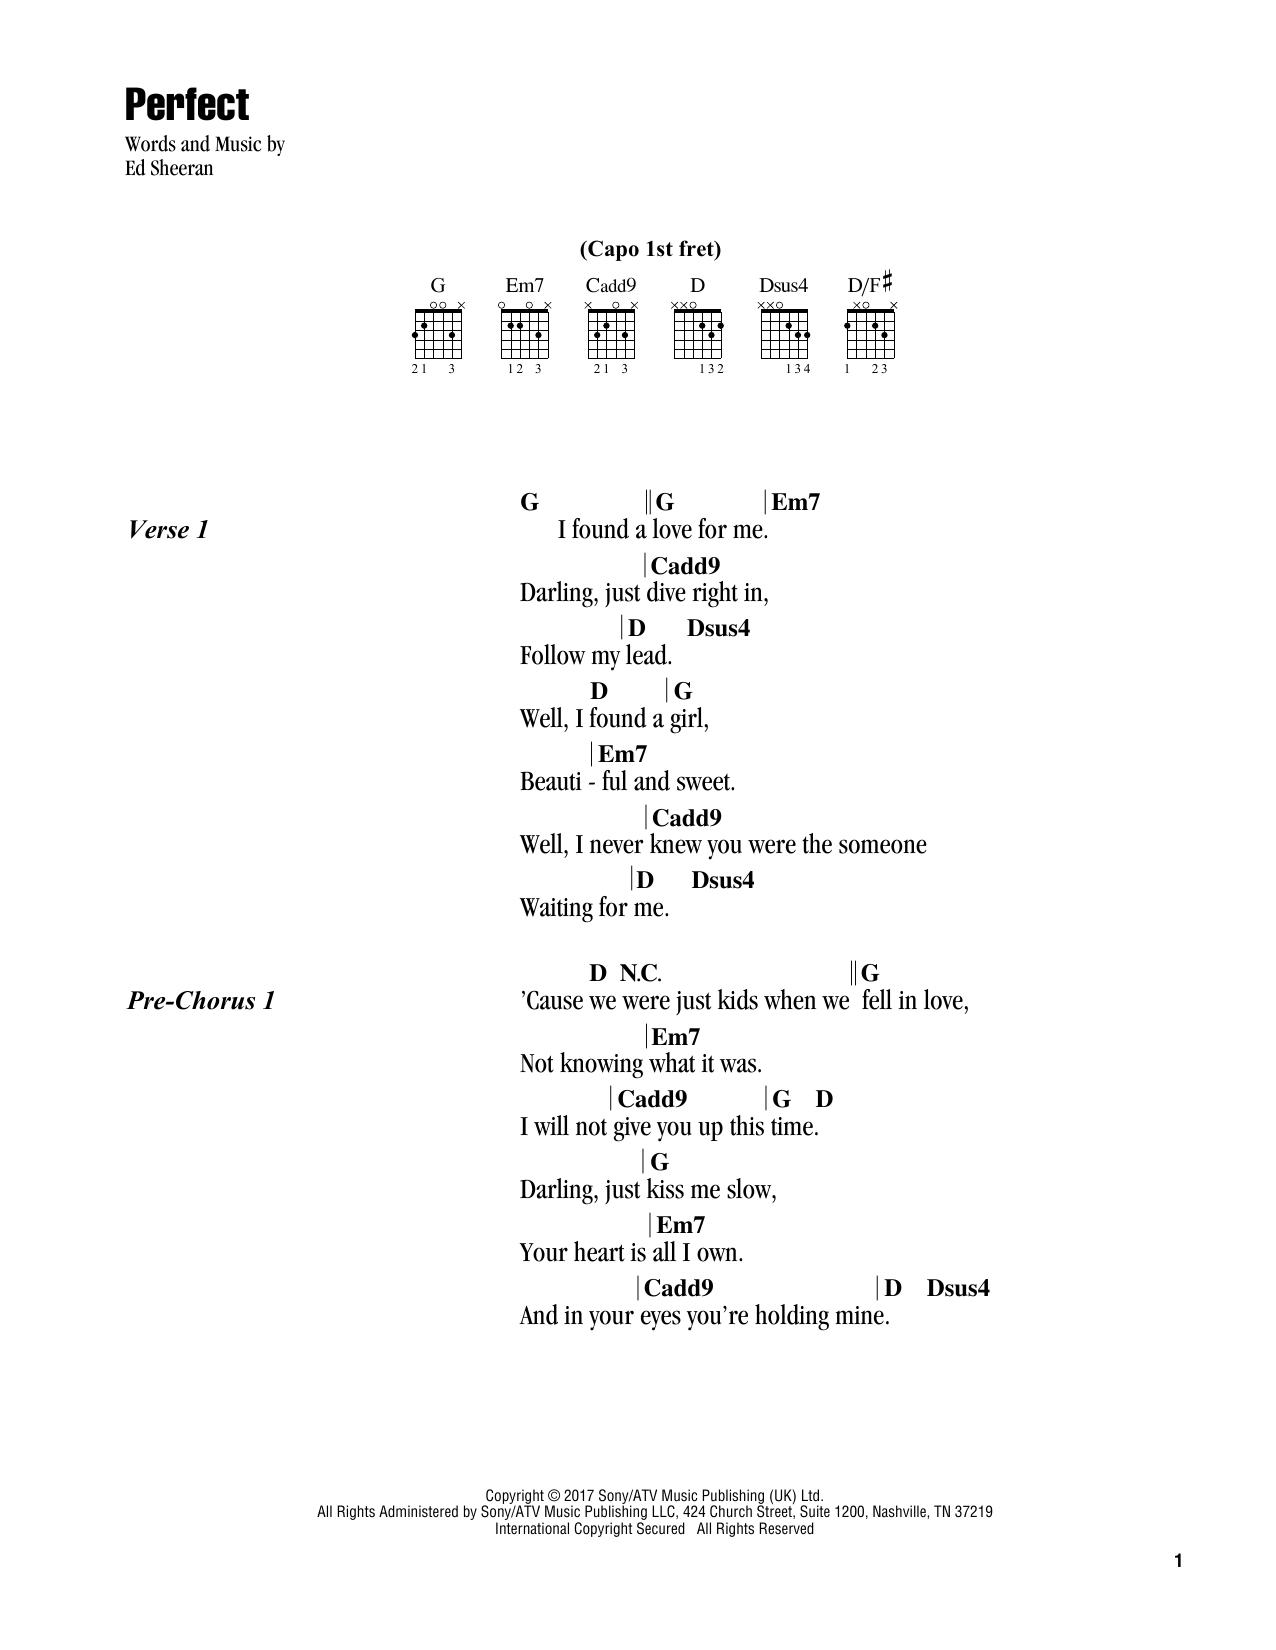 Perfect Sheet Music Ed Sheeran Guitar Chords Lyrics